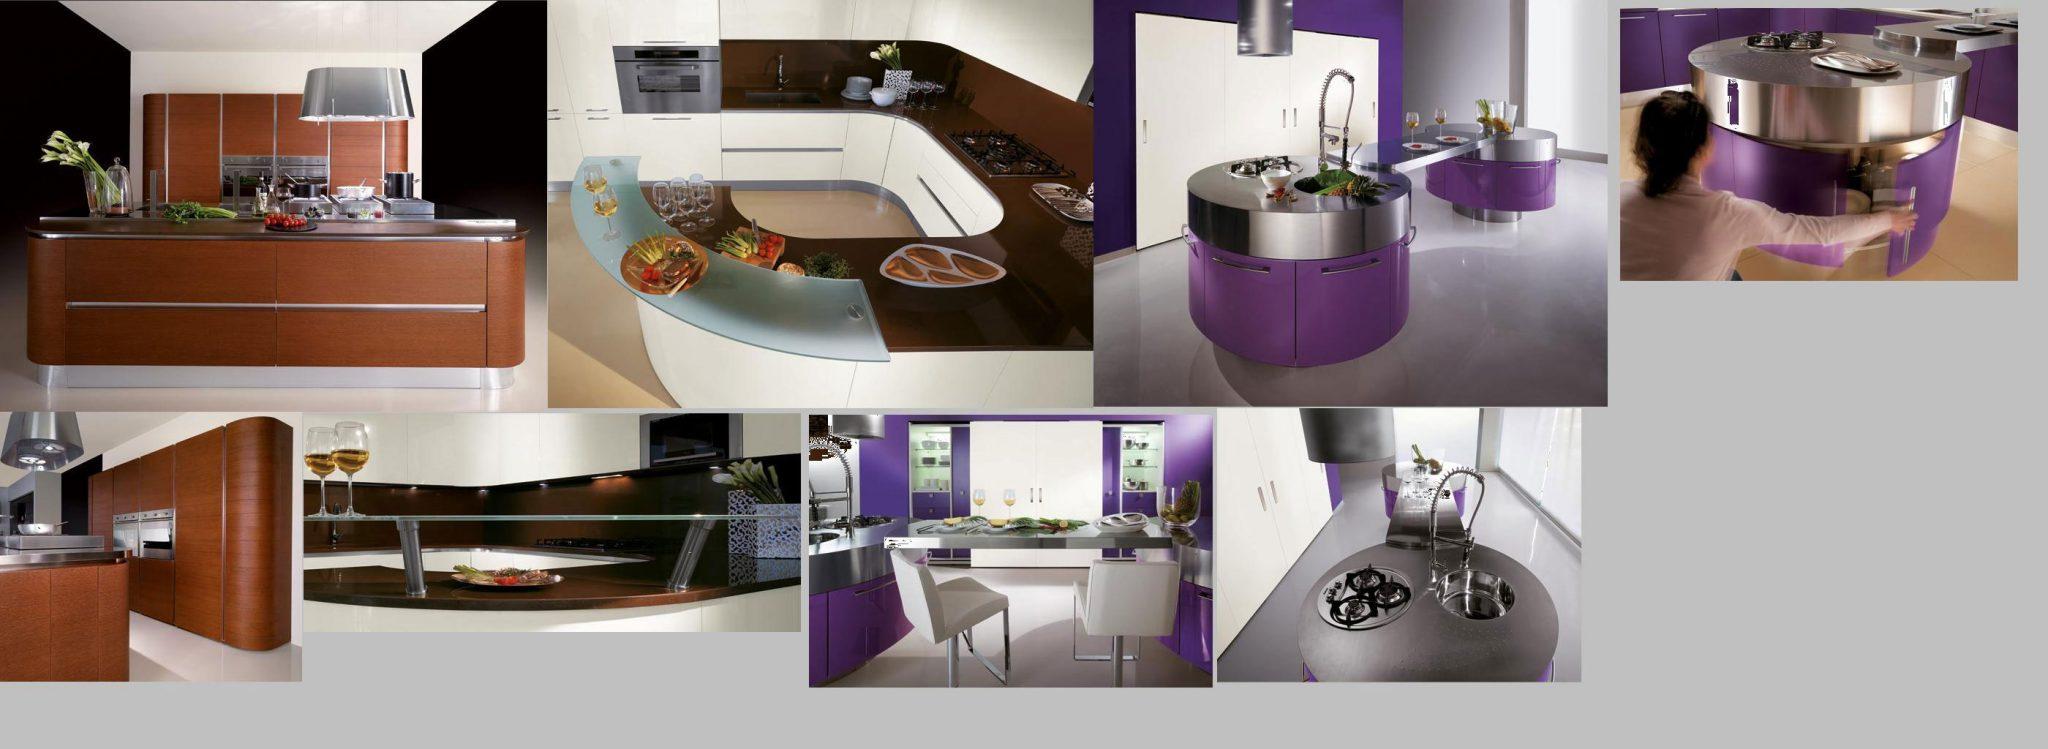 cuisine violet